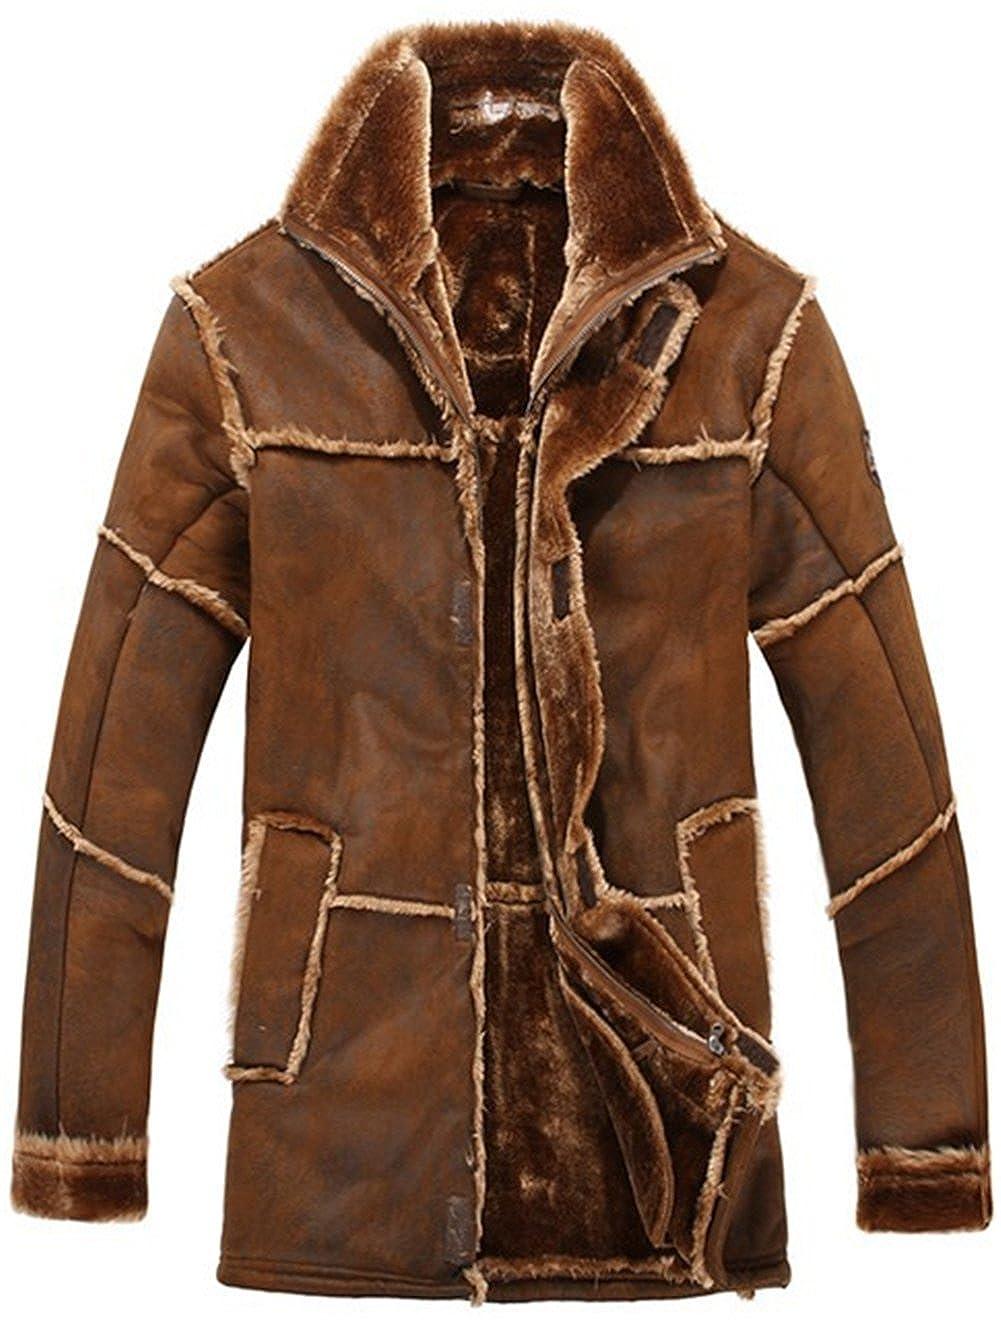 K3K Men's Vintage Suede Sheepskin Faux Fur Jacket Luxury Cashmere Shearling Coat